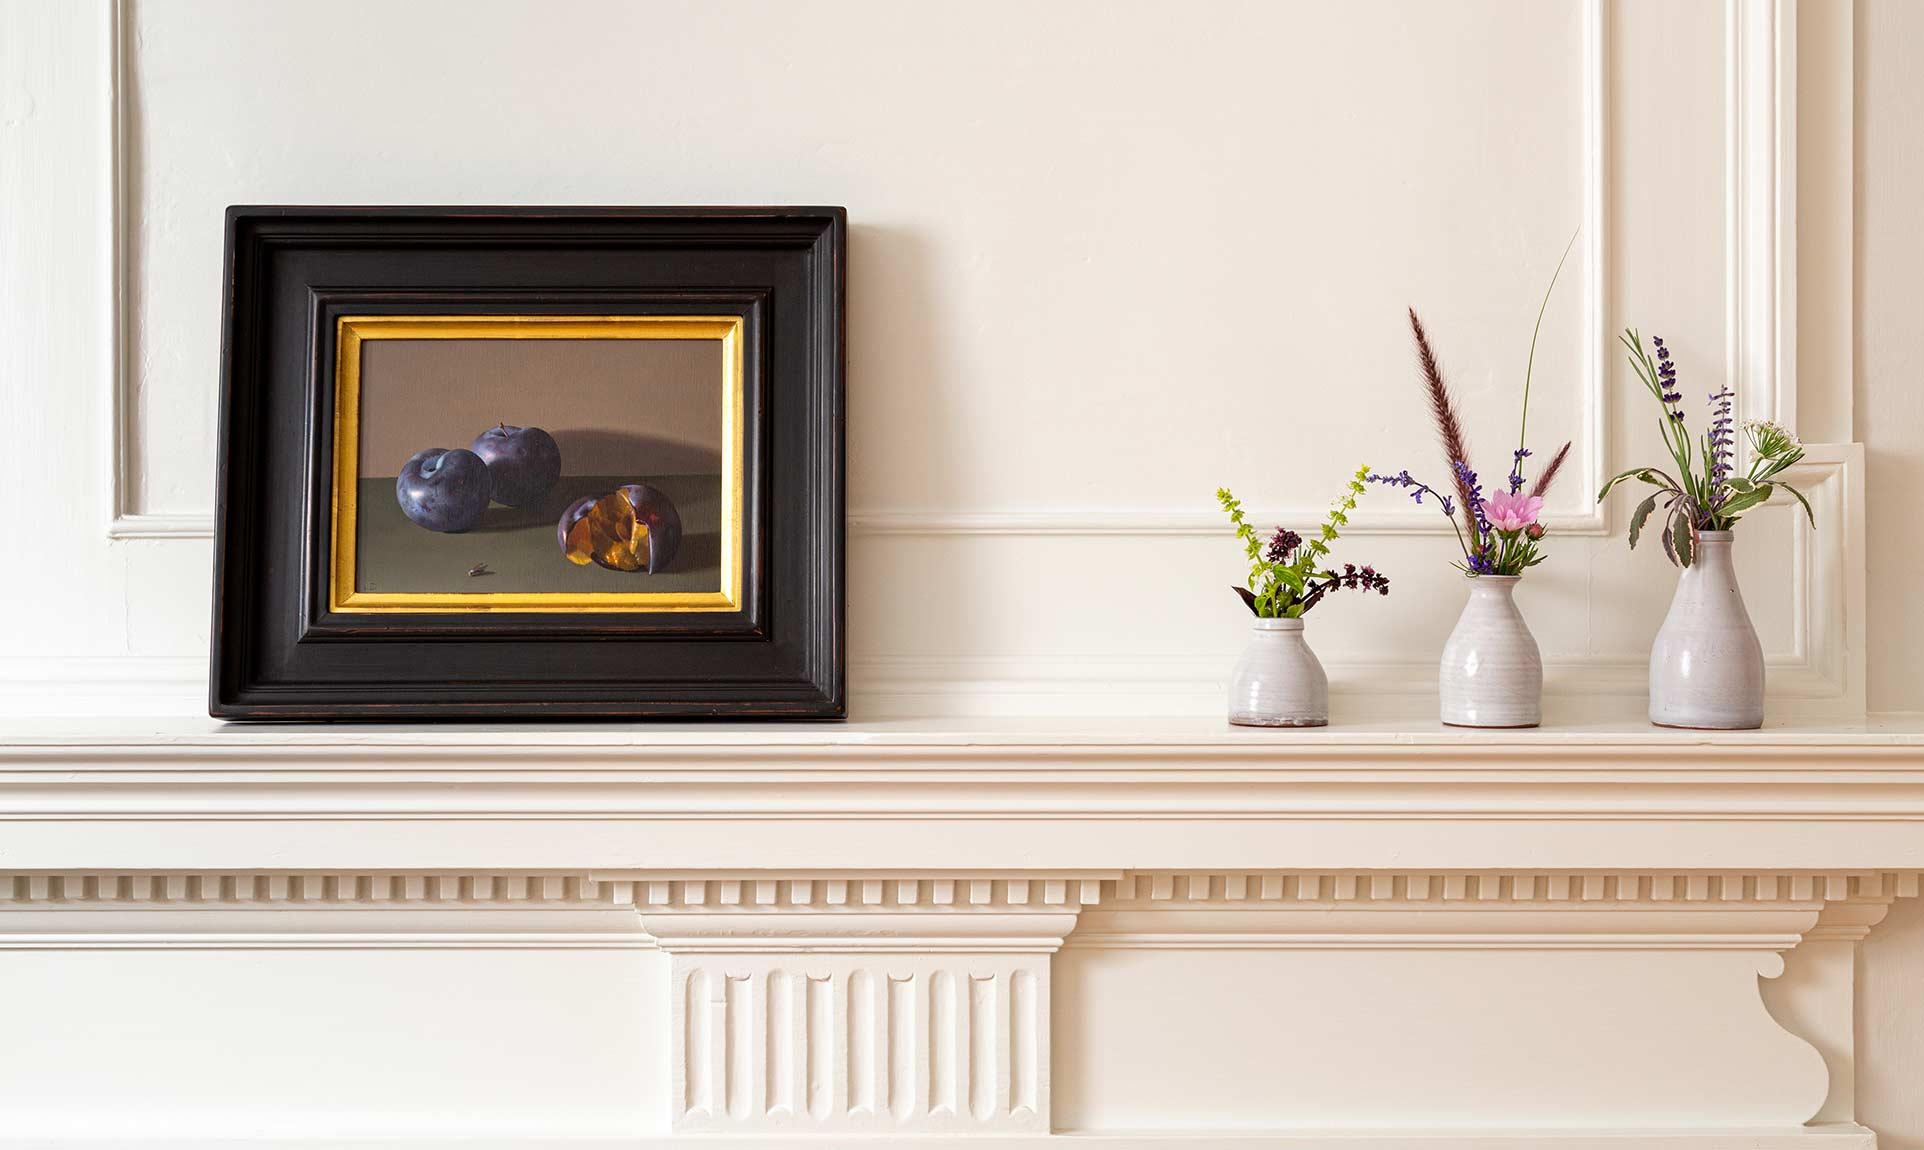 Scott Room Decorative Fireplace